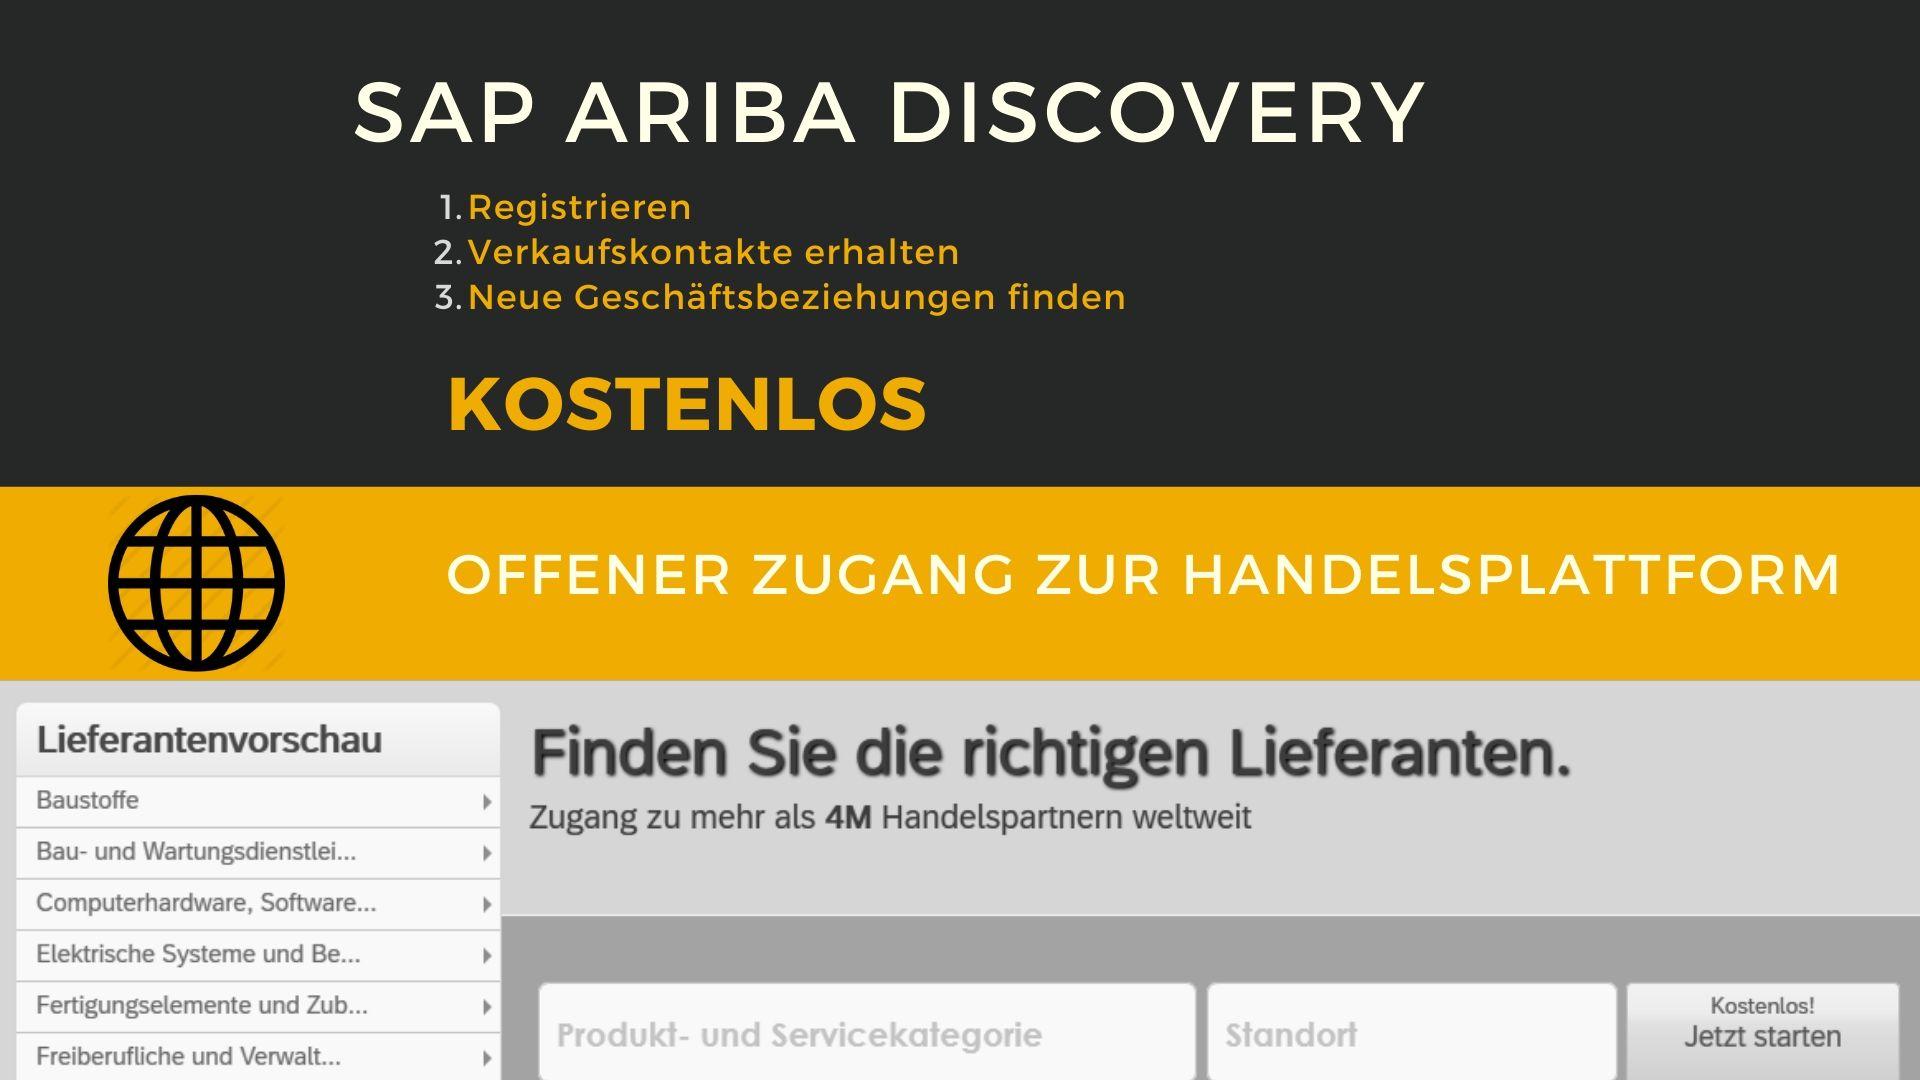 SAP Ariba Discovery kostenloser Zugang